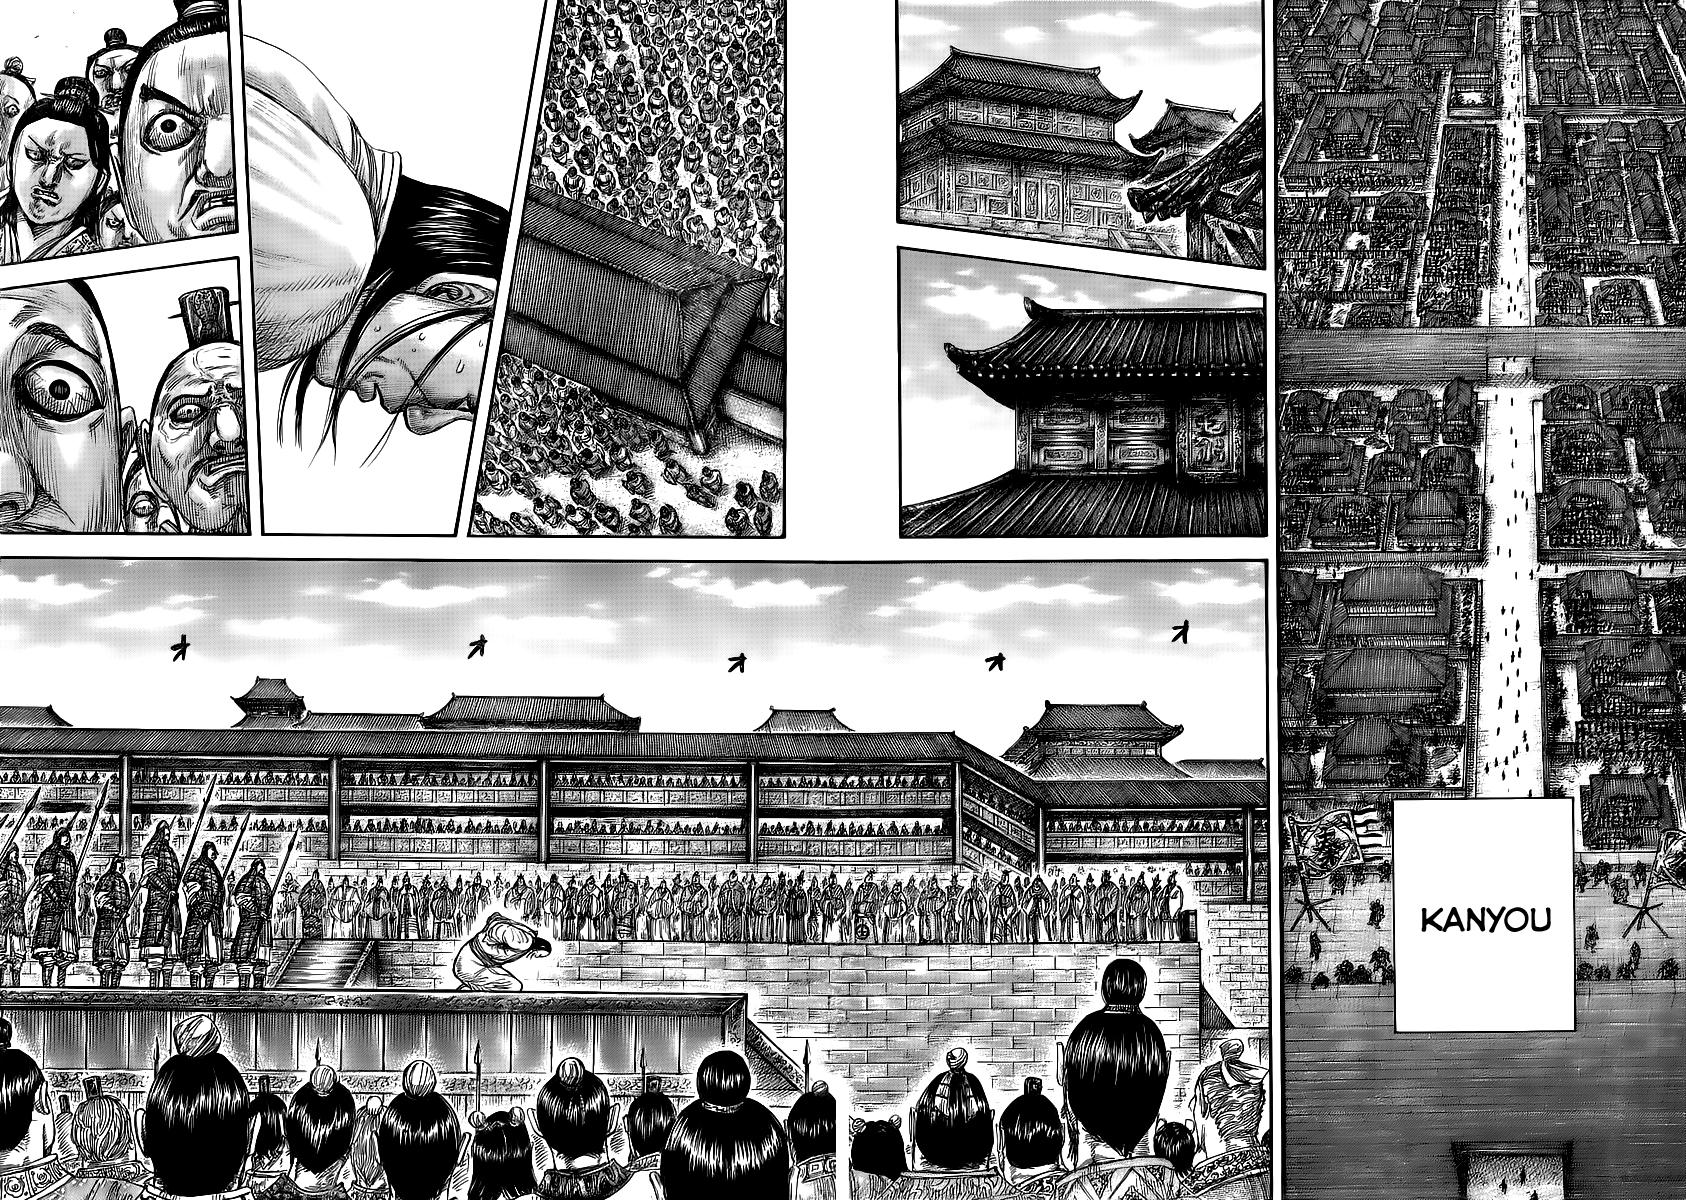 http://c5.ninemanga.com/es_manga/19/12307/382382/d7eb7d66997ca07fff105673fdd76ea8.jpg Page 8